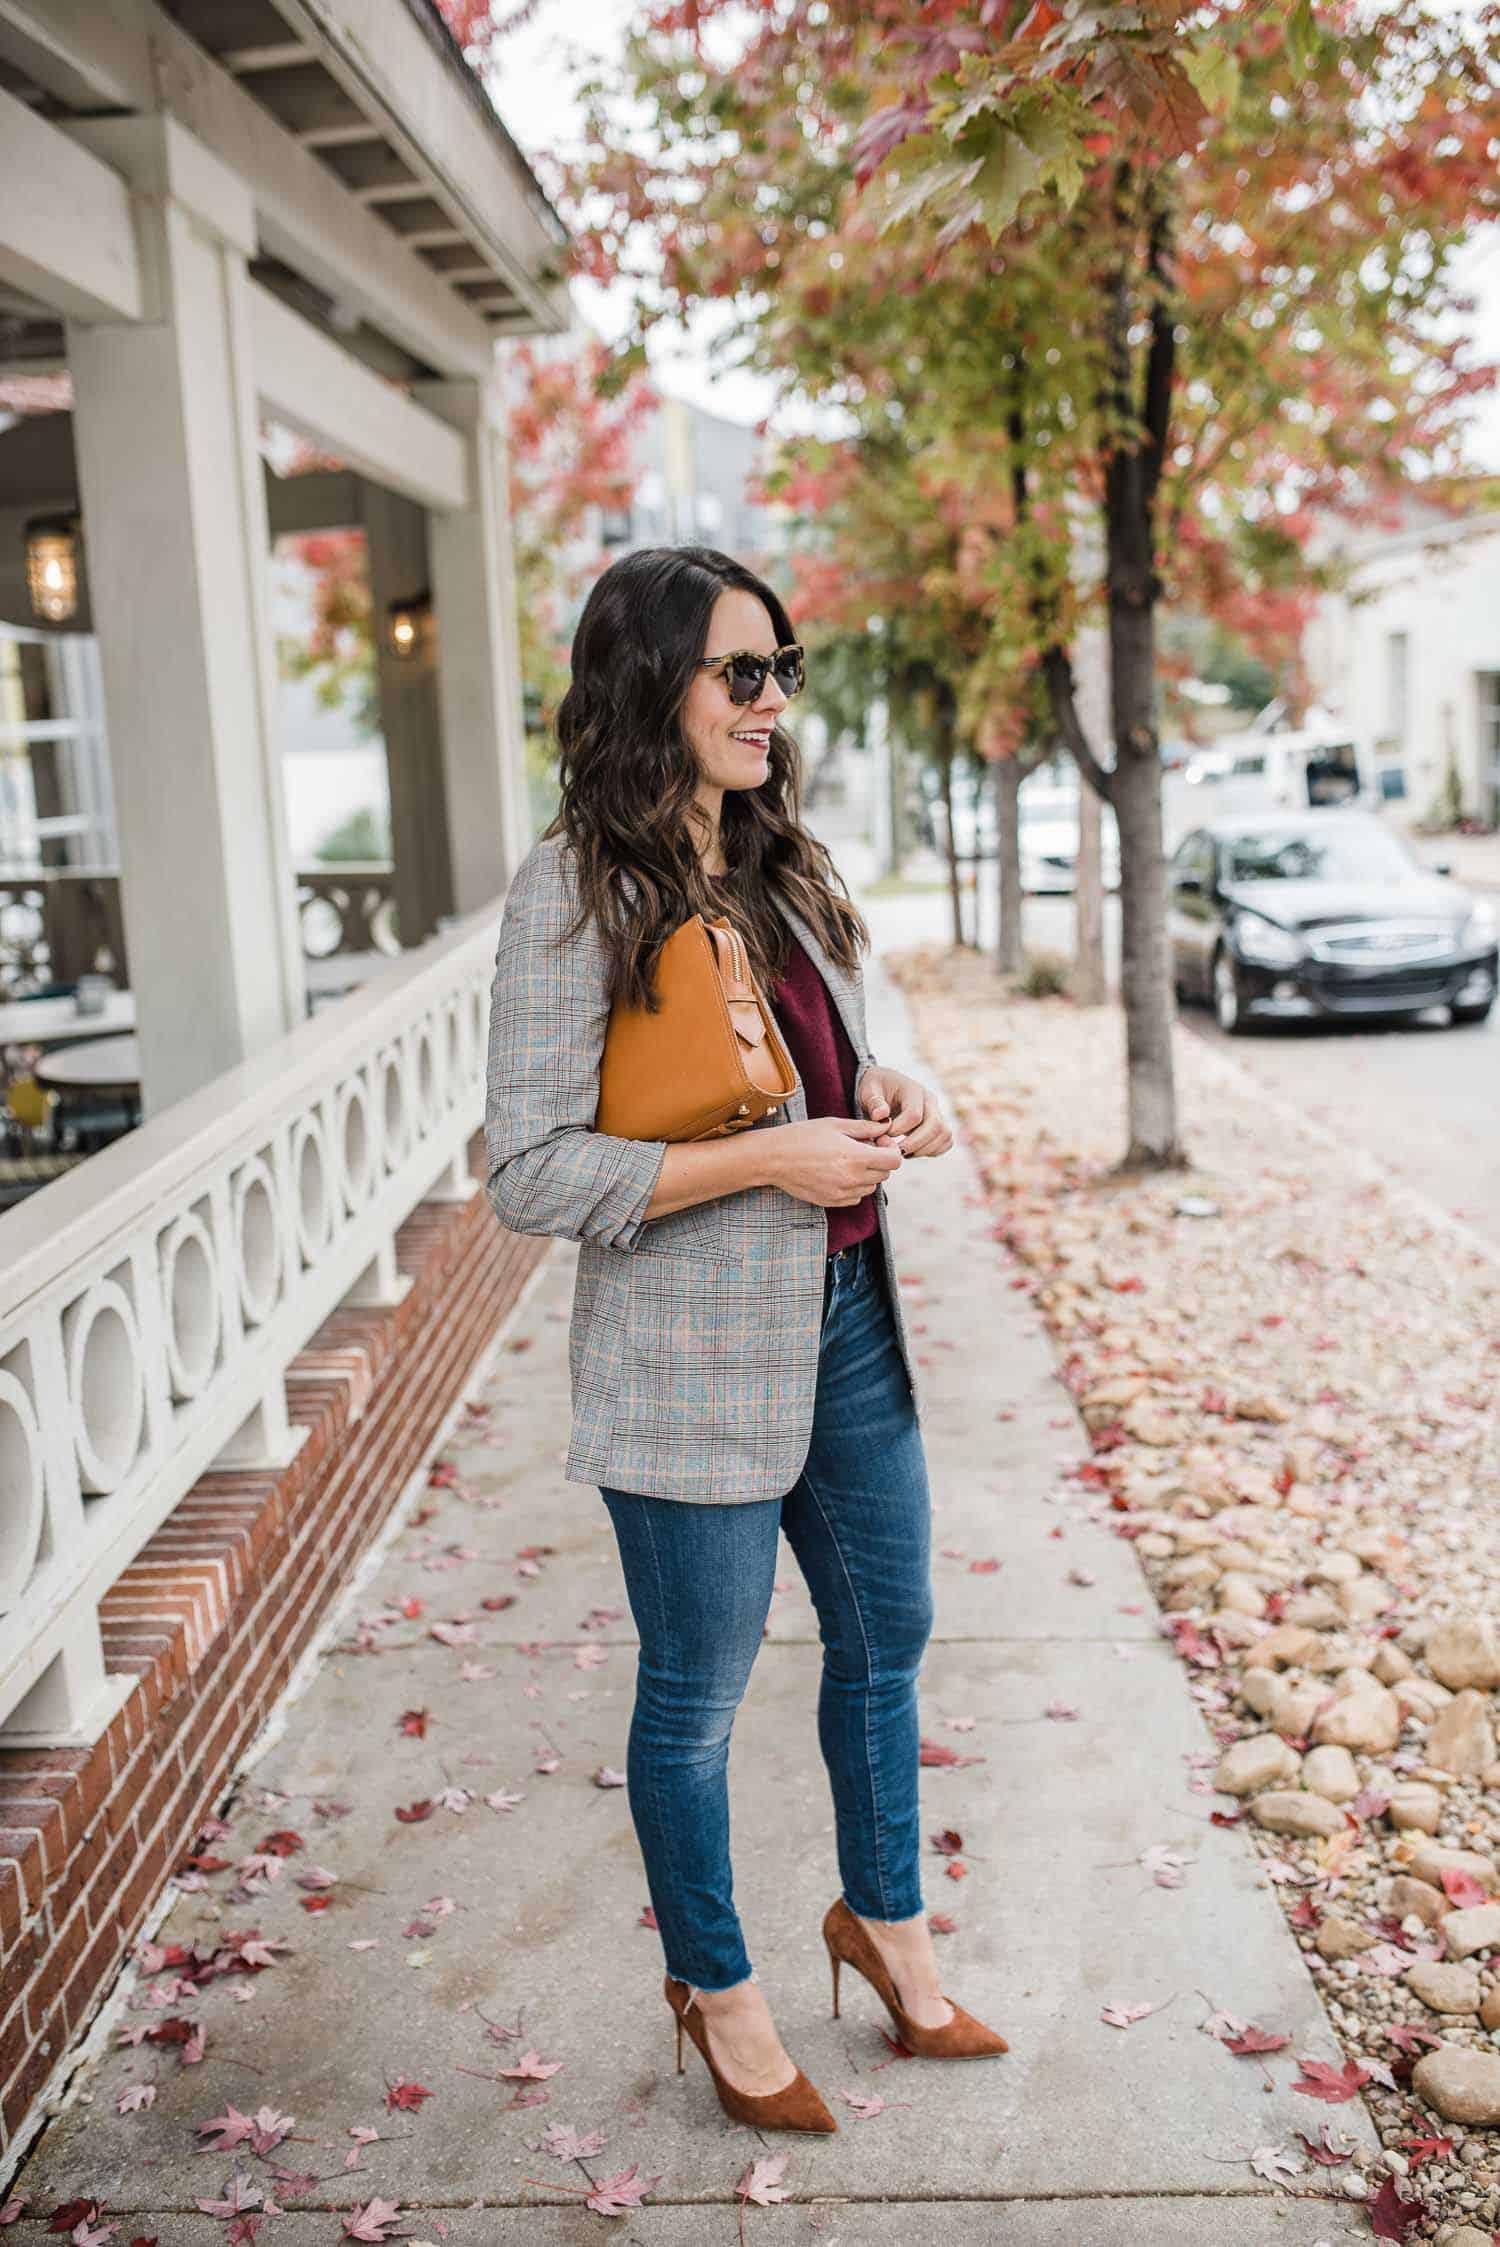 Express Blazer and Sweater • Madewell Jeans • Steve Madden Heels (under $100) • Gigi NY Bag • Karen Walker Sunglasses